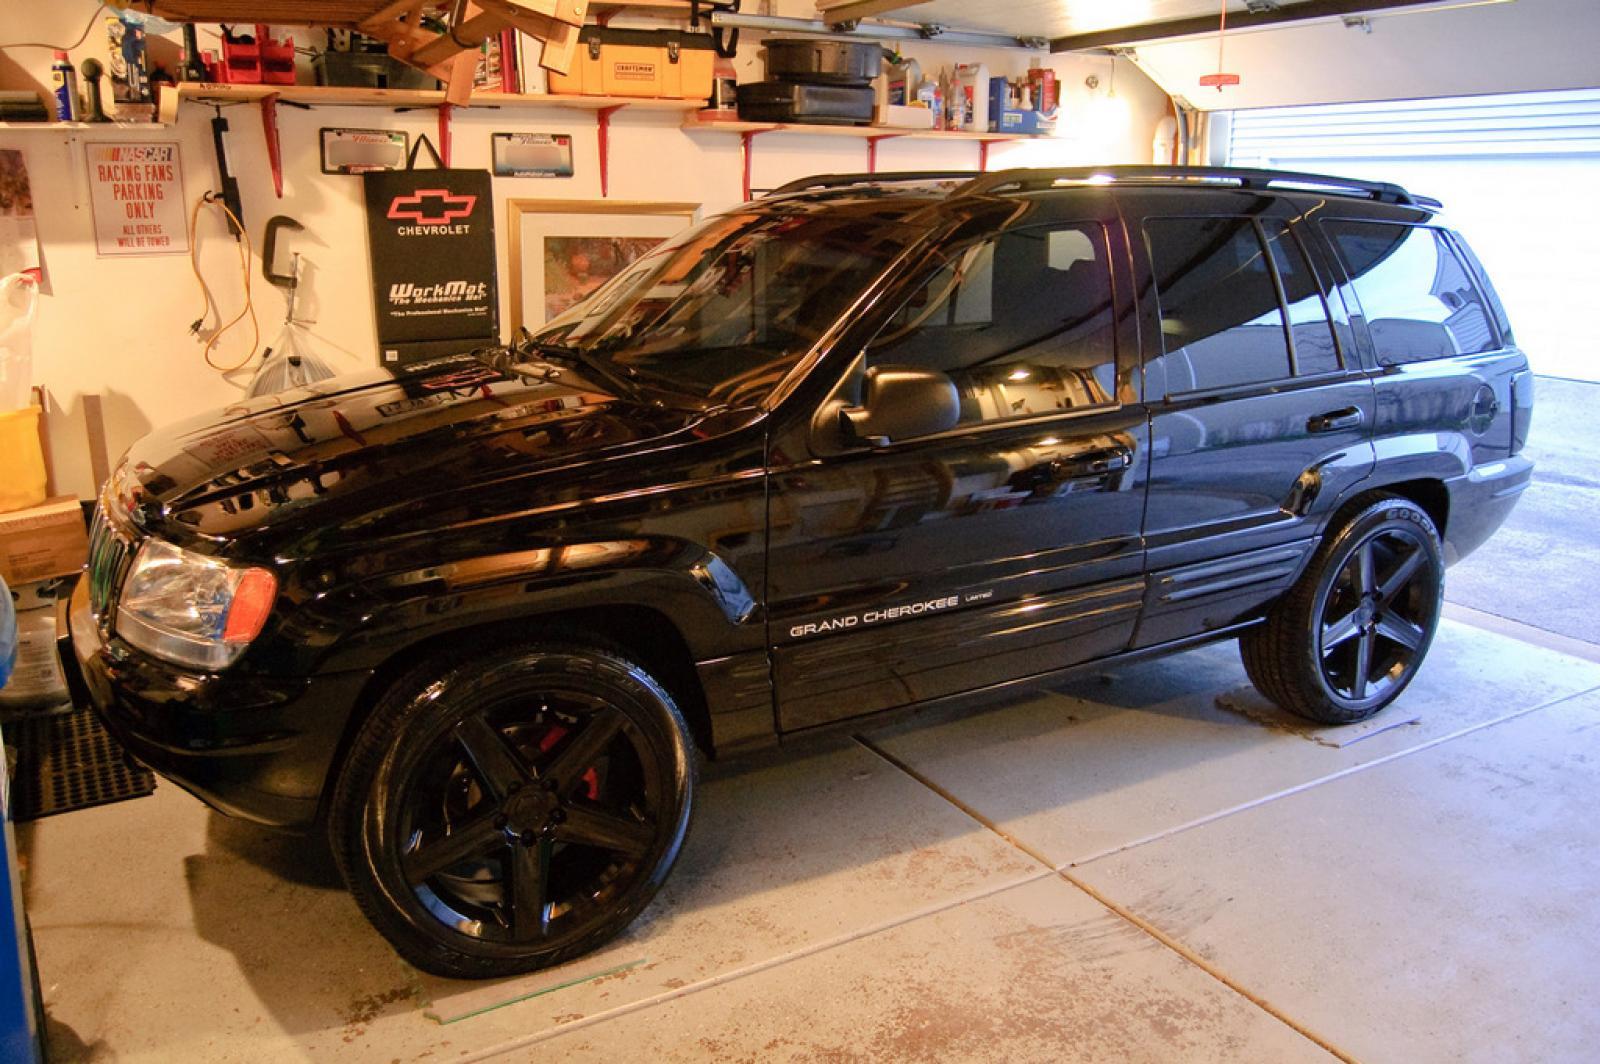 2002 Jeep Grand Cherokee #2 Jeep Grand Cherokee #2 800 1024 1280 1600  Origin ...